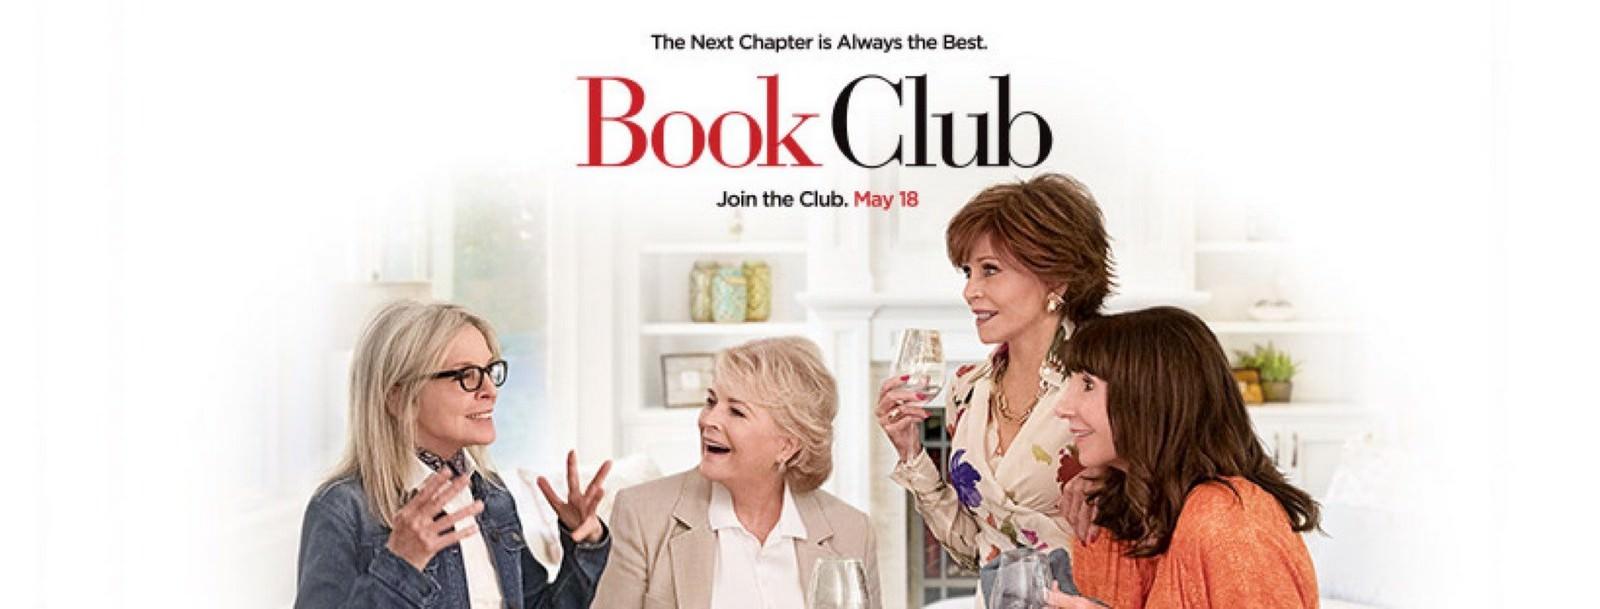 Movie, Book Club(美國) / 高年級姐妹會(台) / 读书会(網), 電影海報, 美國, 橫版